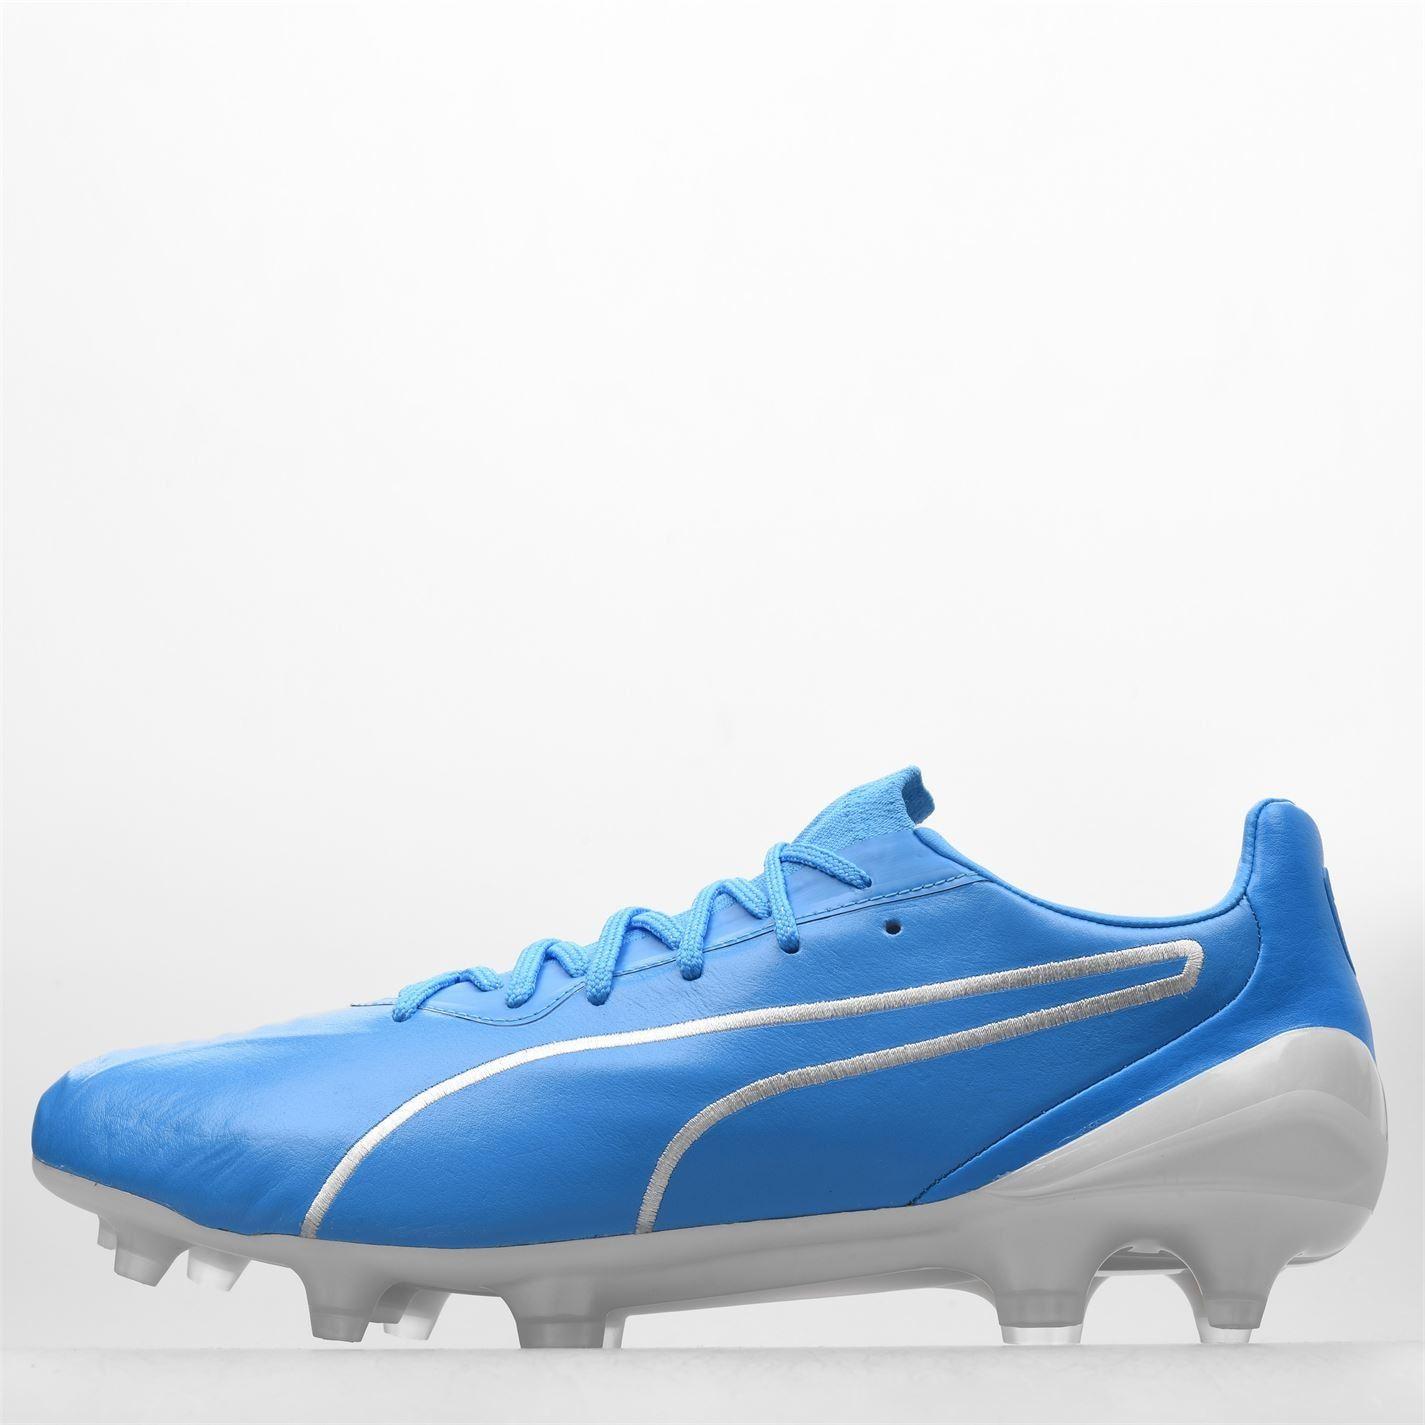 miniature 9 - Puma-King-FG-Firm-Ground-Football-Bottes-Homme-Chaussures-De-Foot-Crampons-Baskets